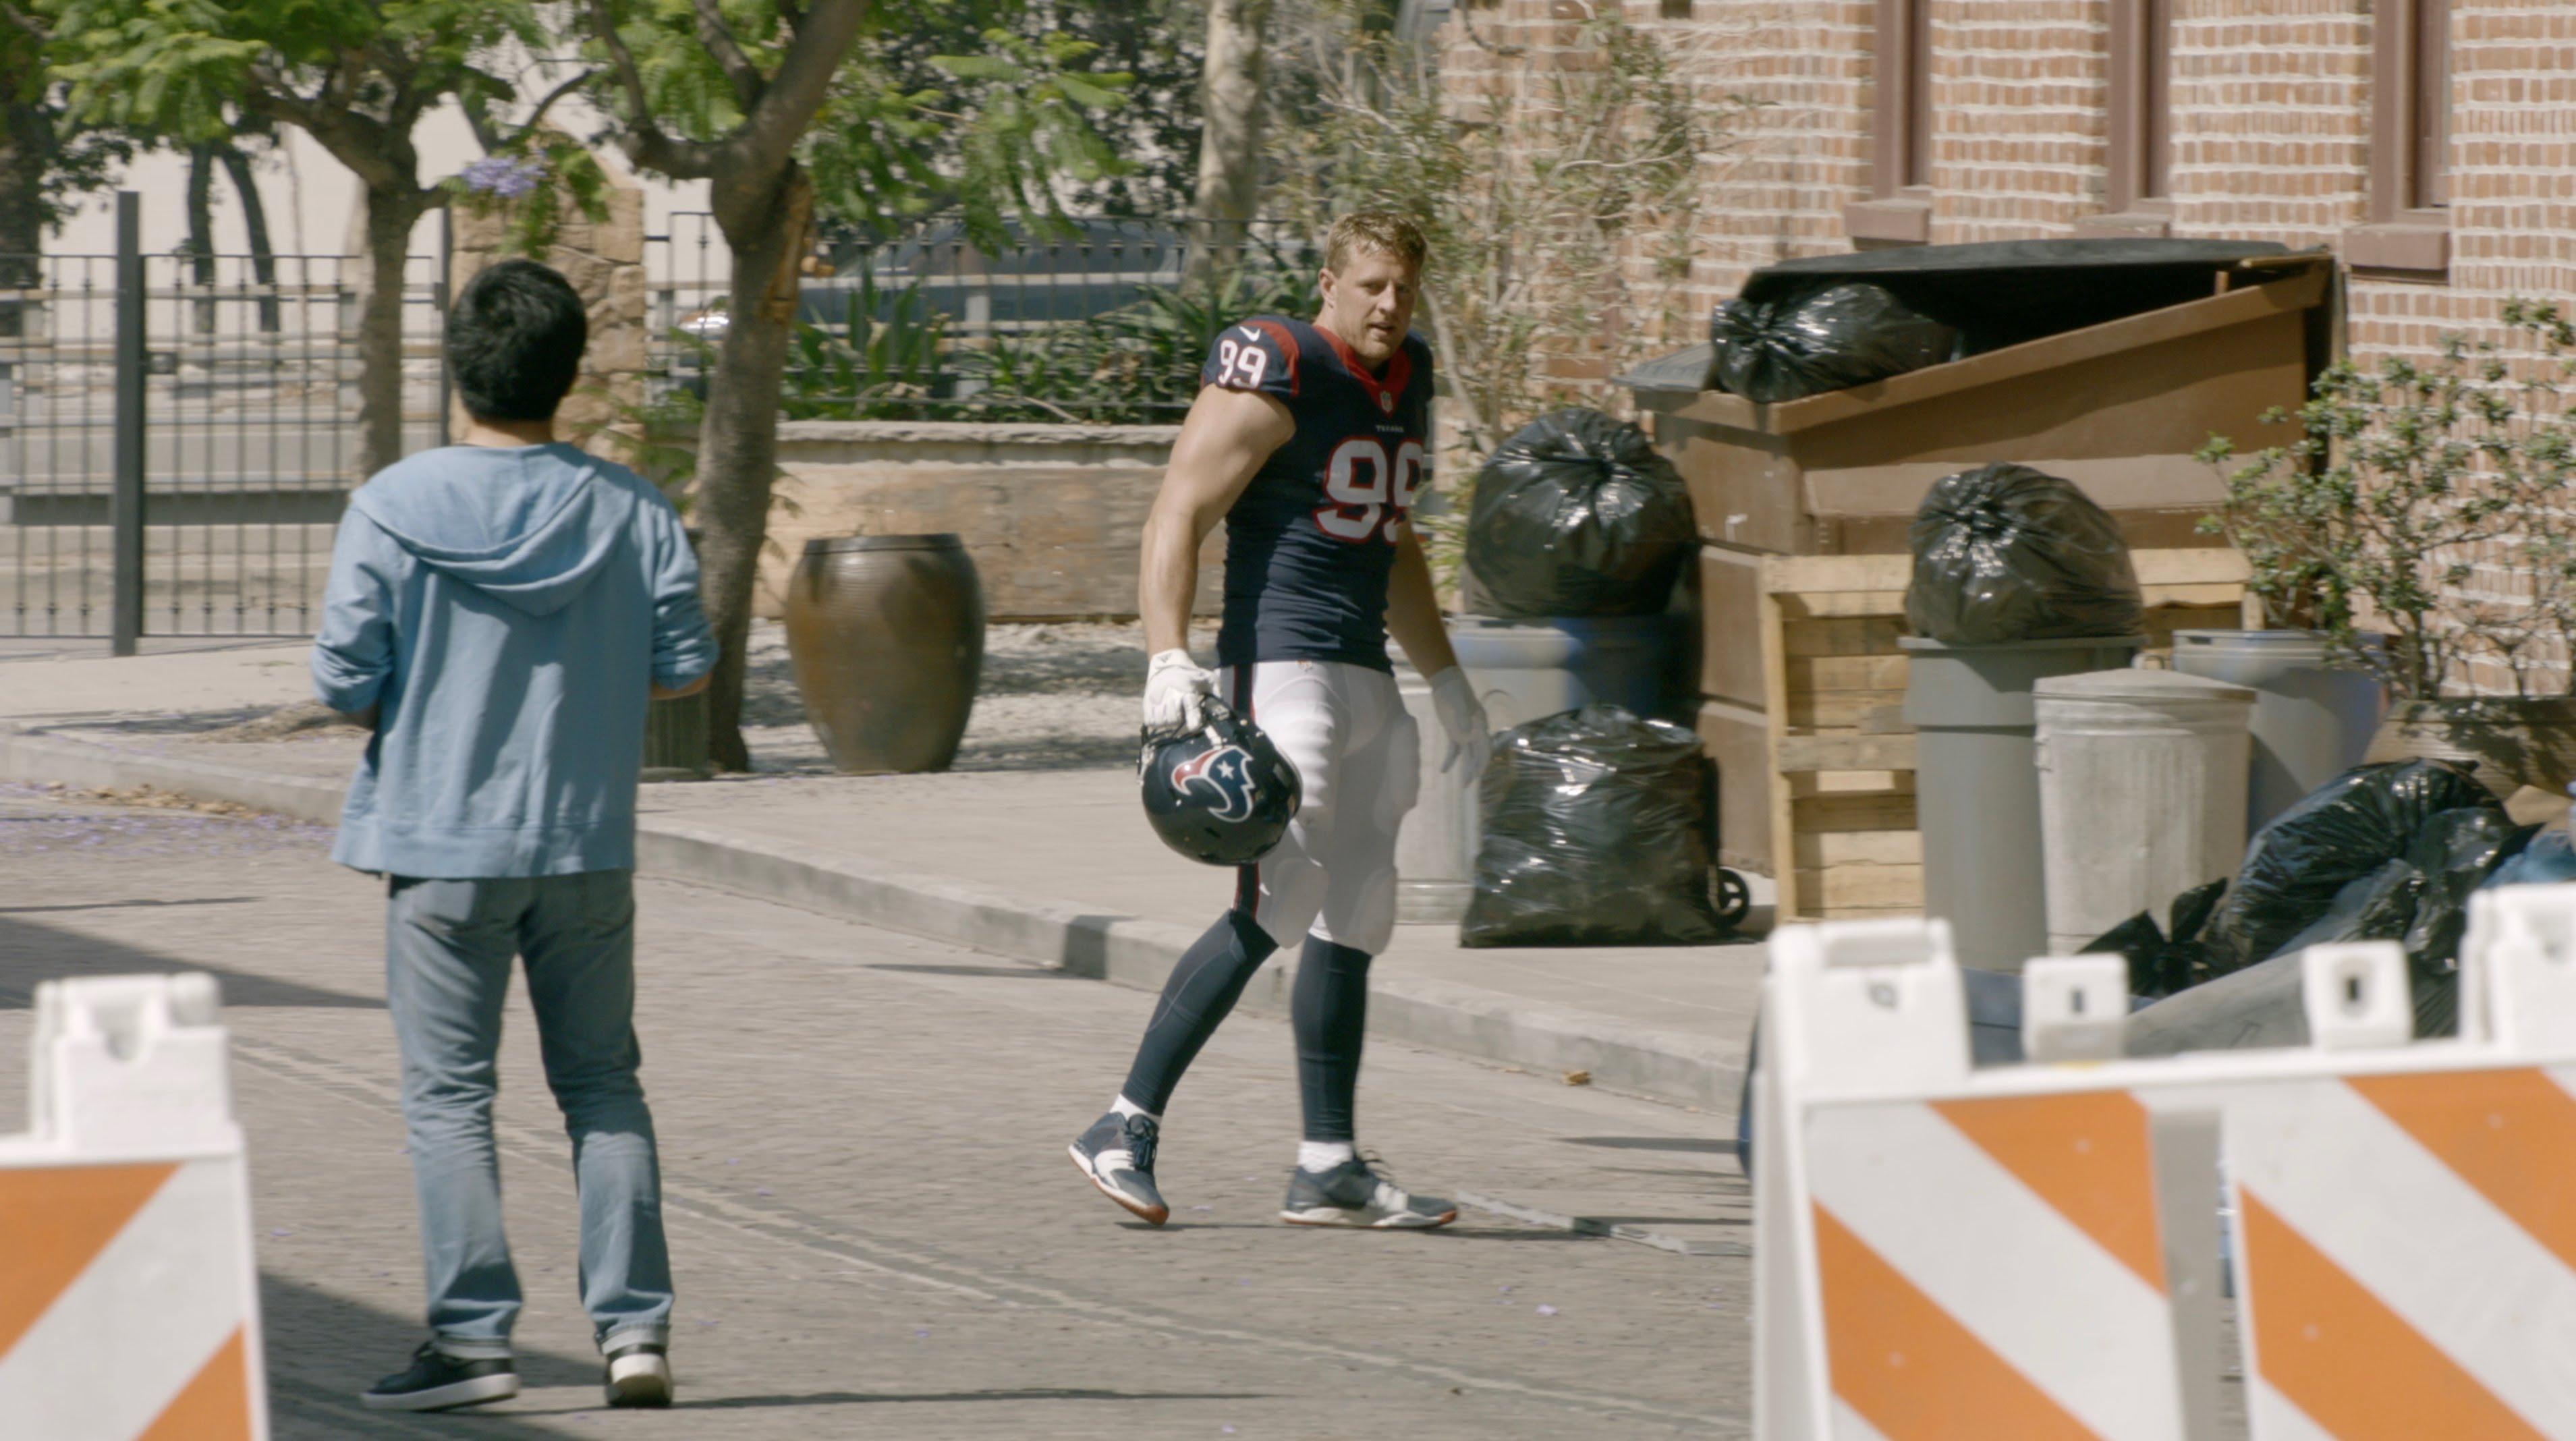 JJ Watt terrorizes a civilian in new Gatorade commercial